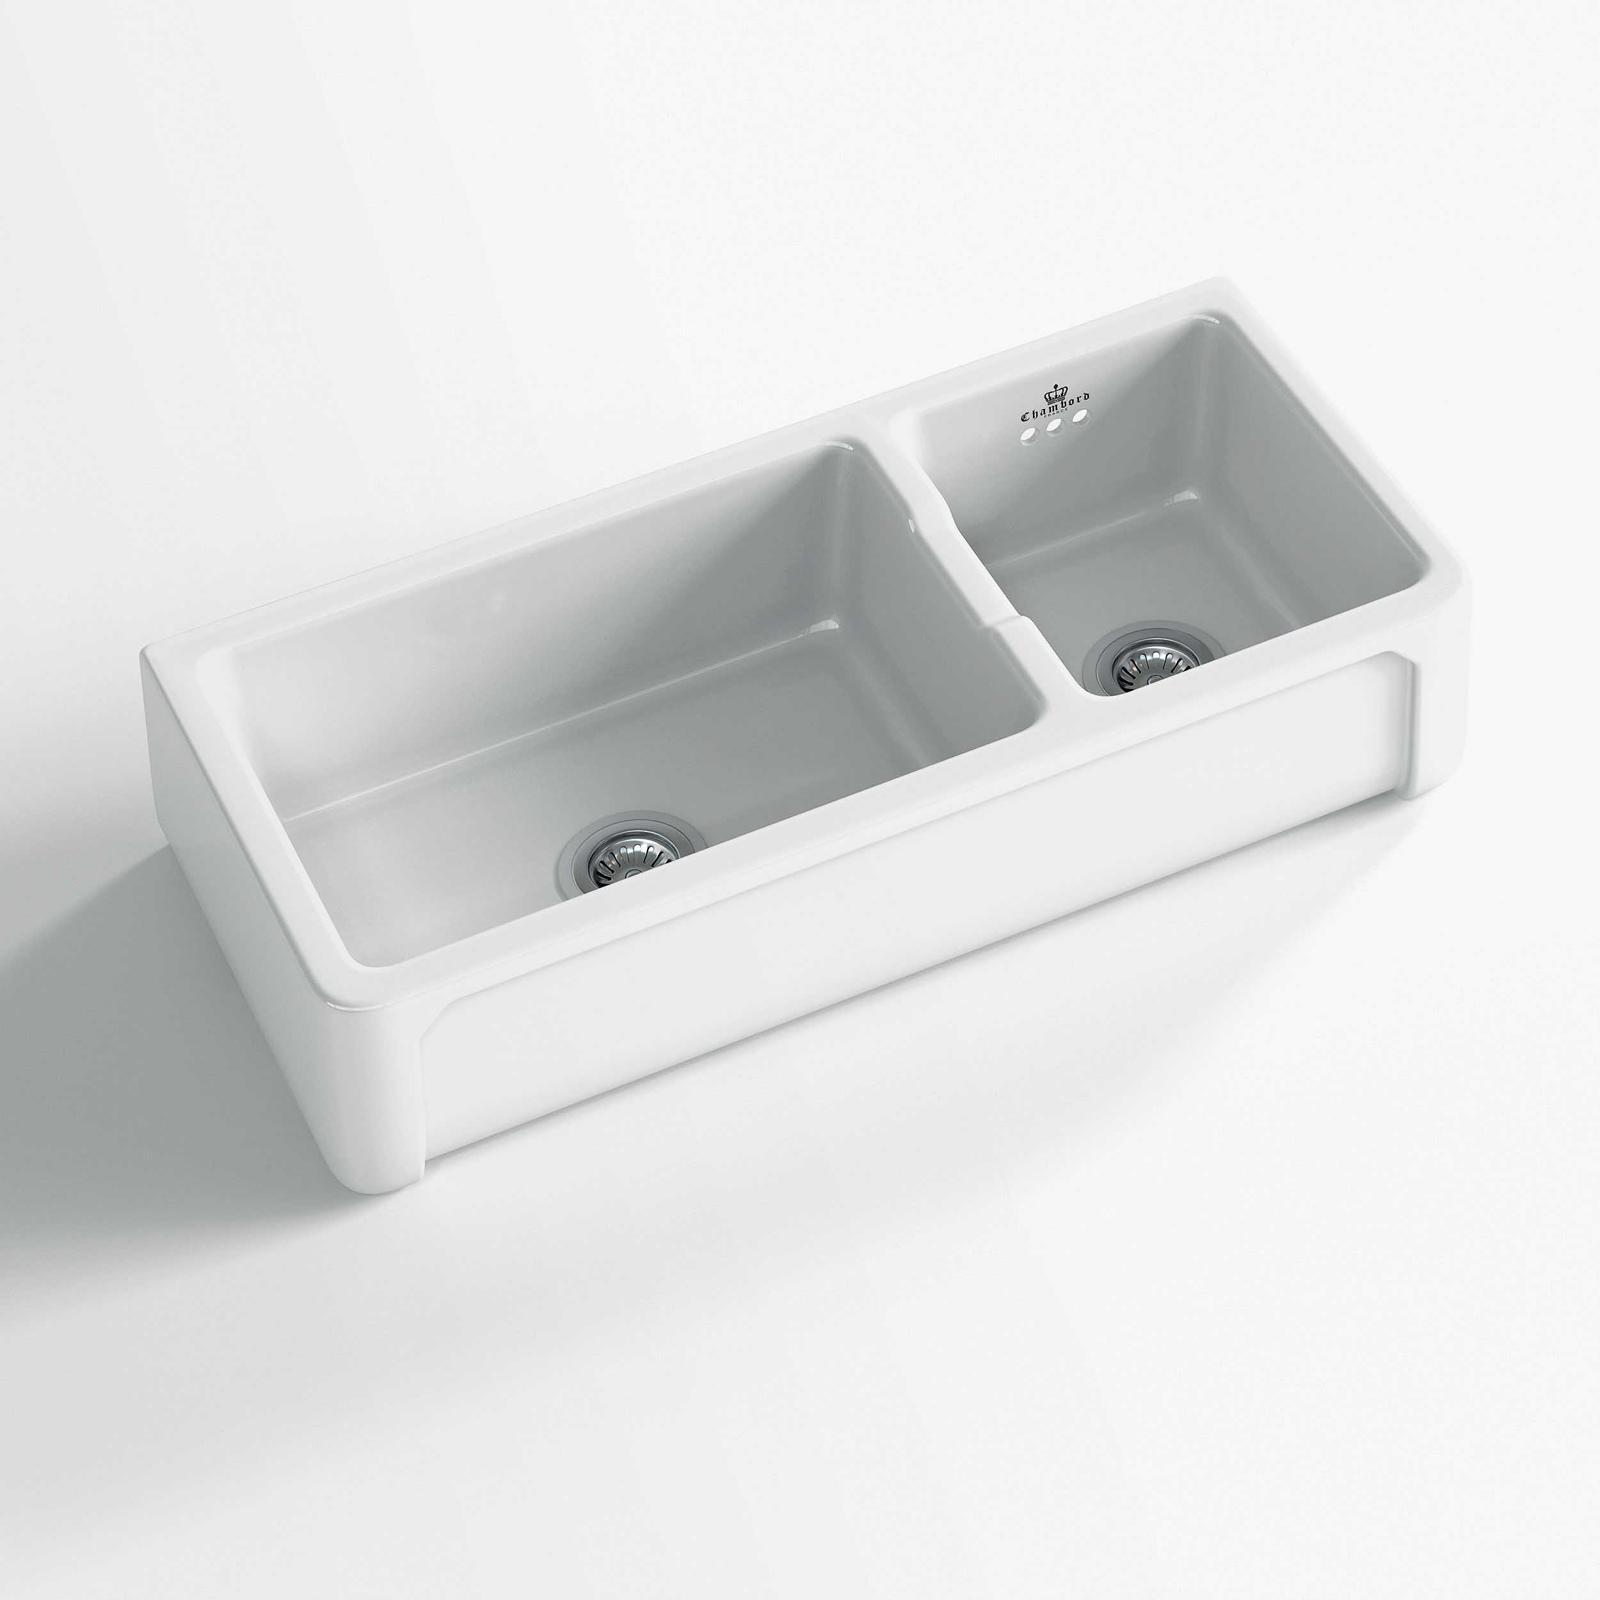 High-quality sink Henri III - one and a half bowl, ceramic